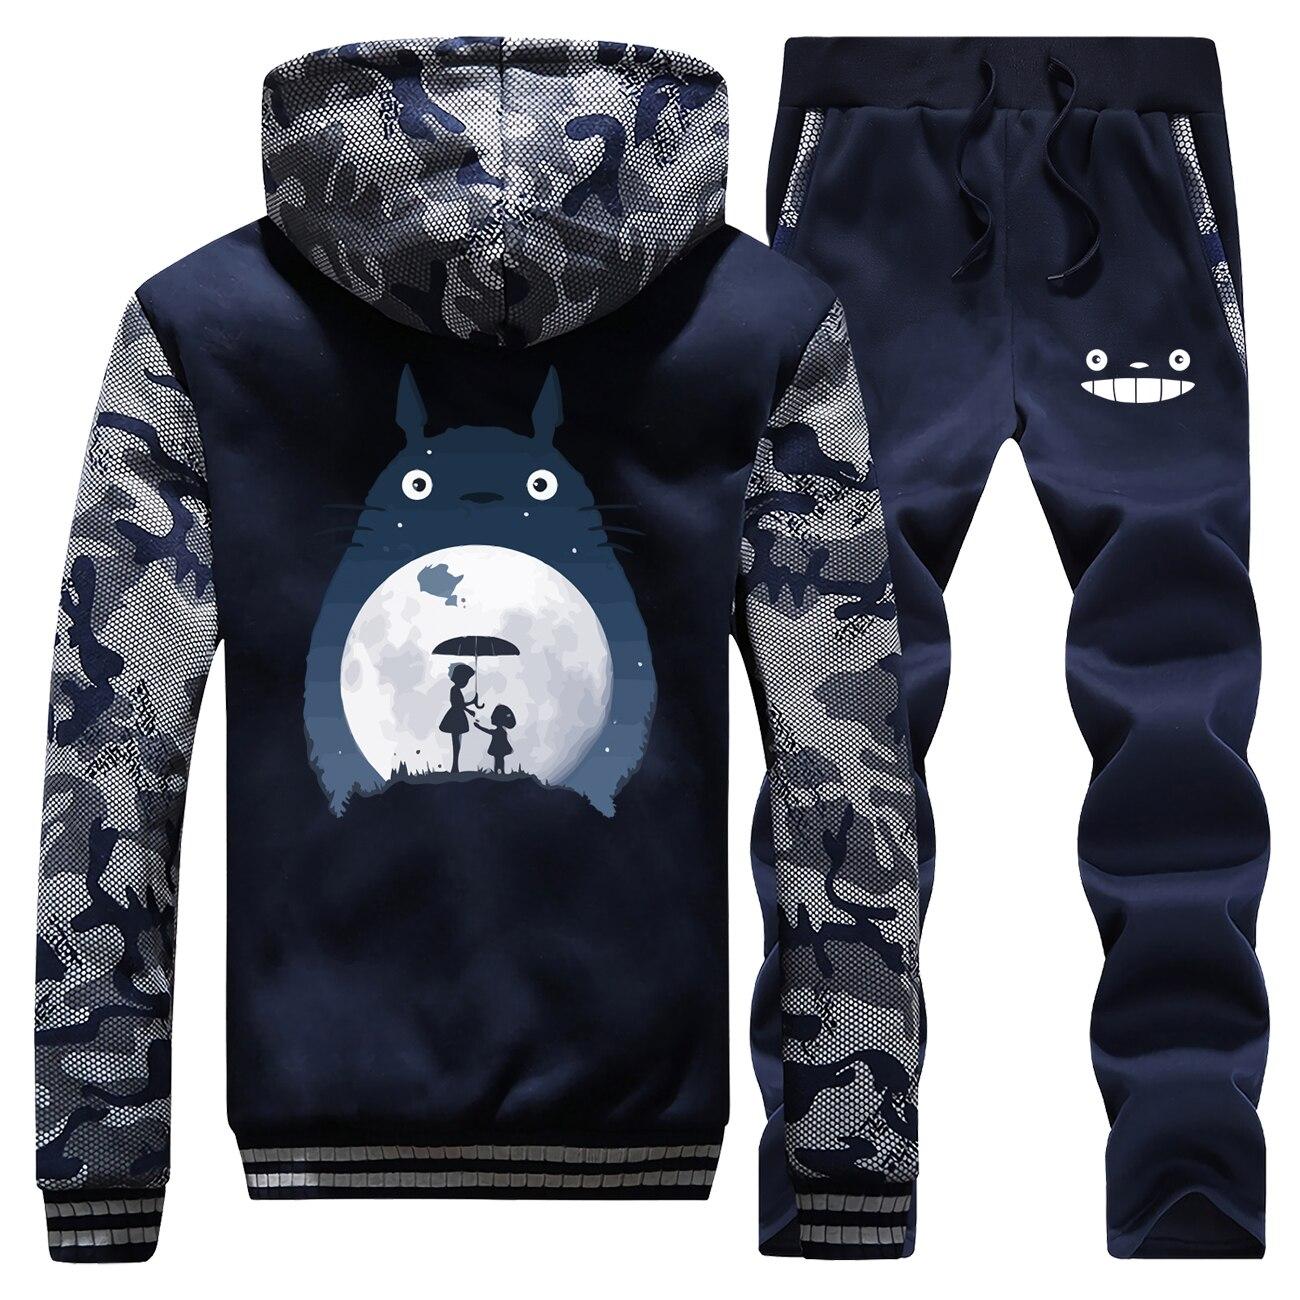 Tonari No Totoro Men Thick Hoodies Sweatshirt+Pants 2 Piece Sets Warm Suit Vintage Japanese Anime Jacket Mens Winter Tracksuit